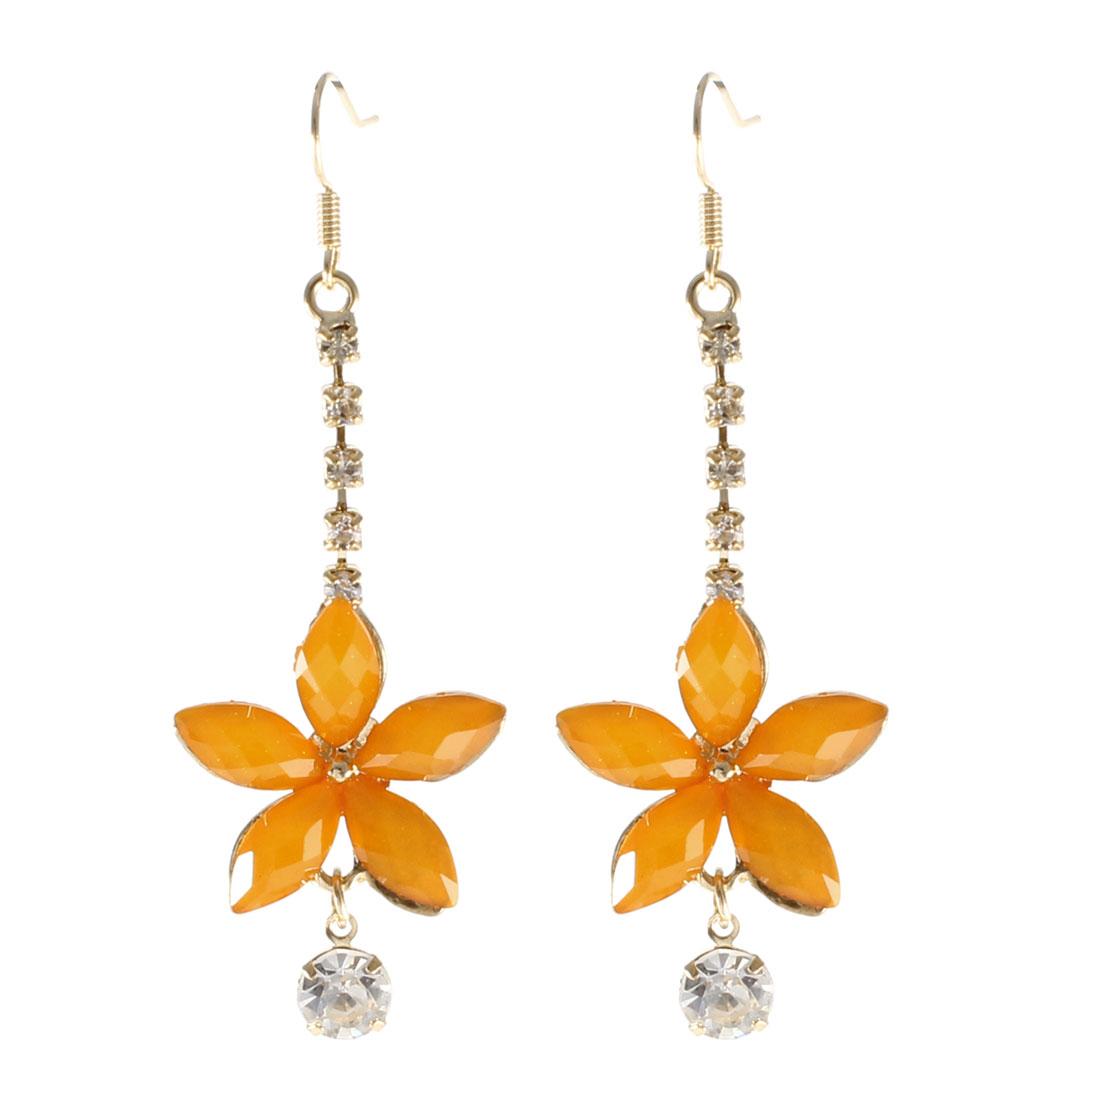 Pair Gold Tone Orange Plastic Beads Rhinestones Decor Floral Fish Hook Earrings